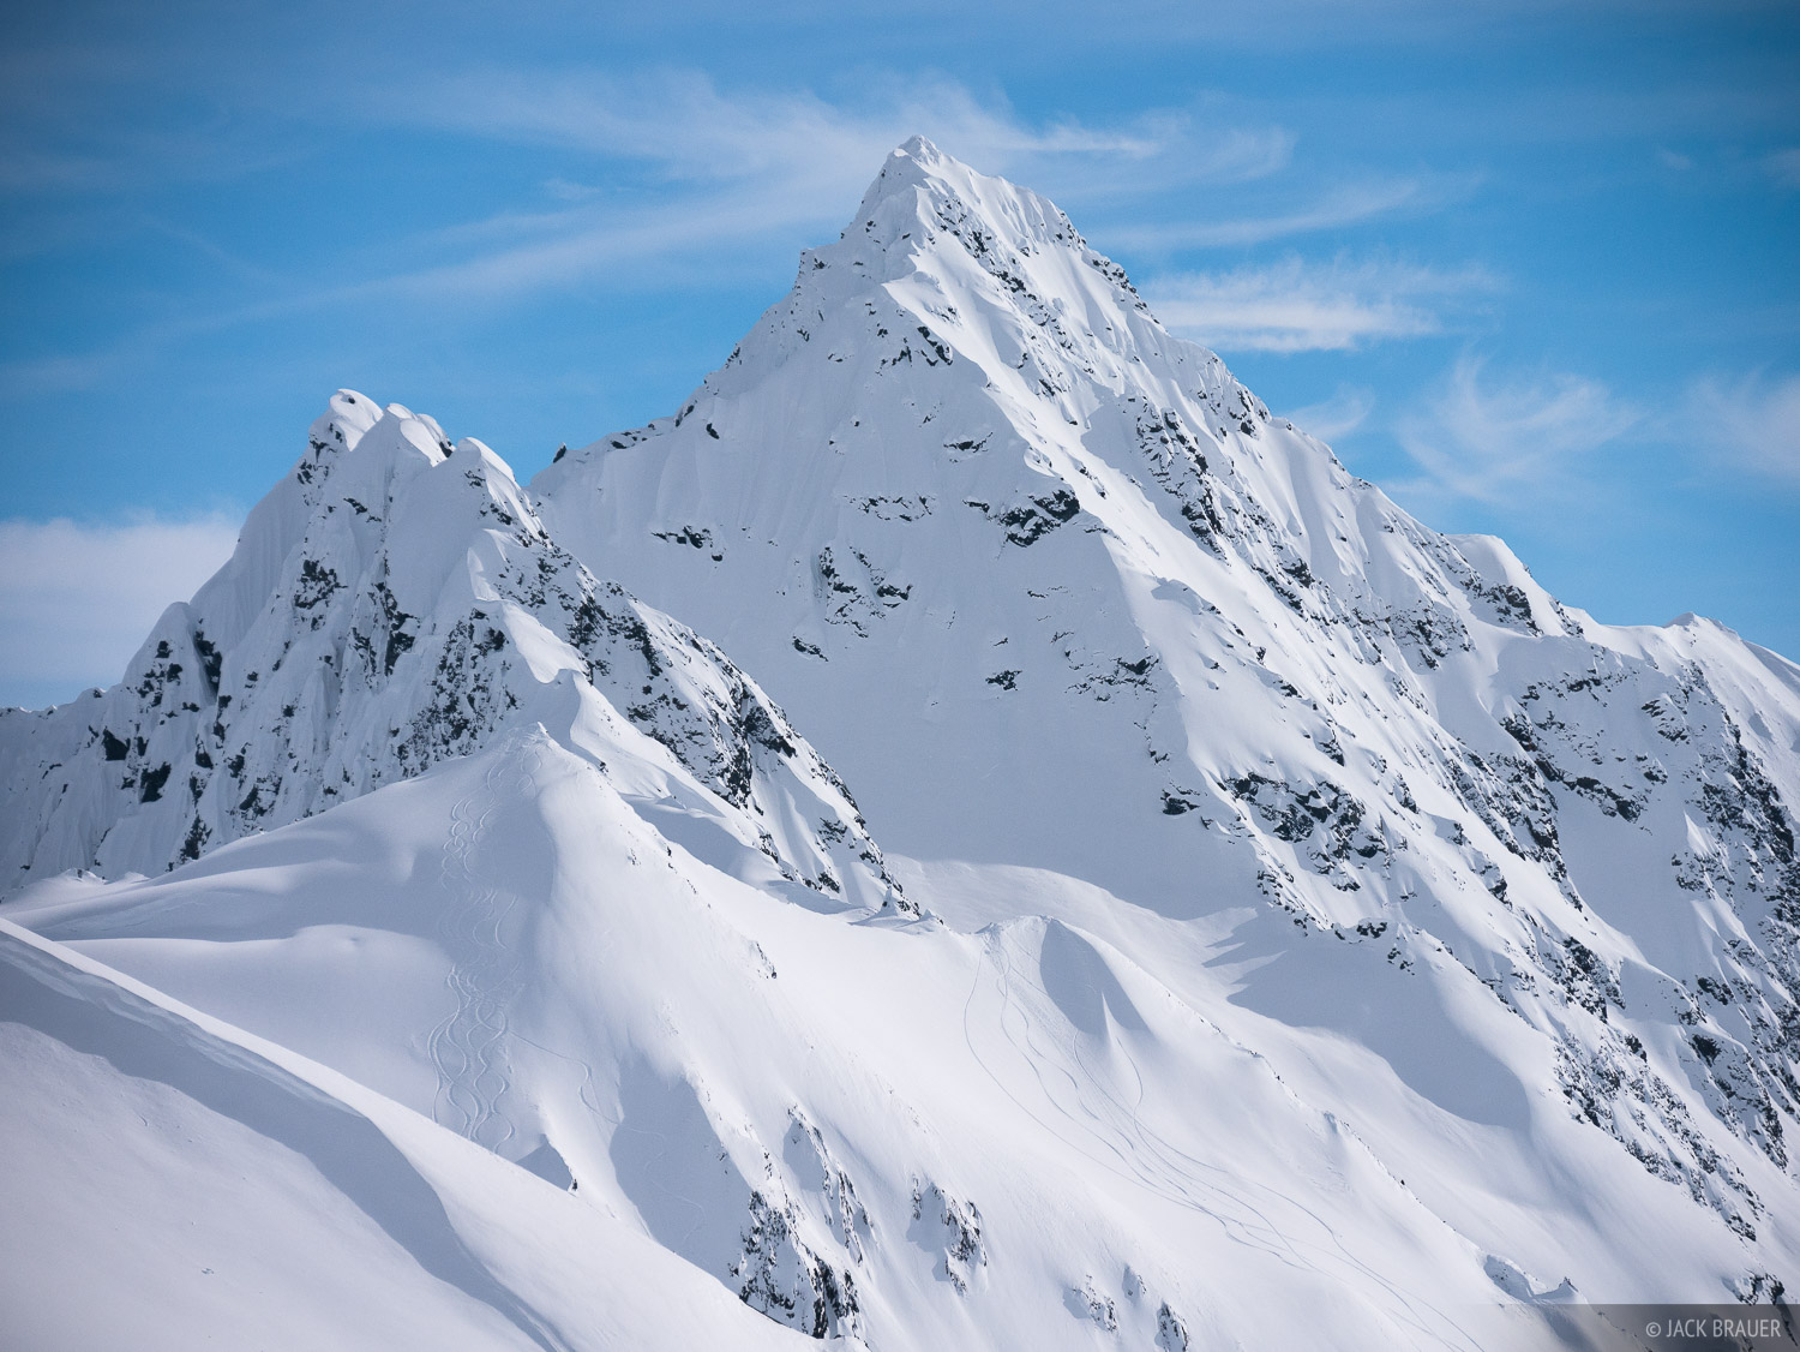 Alaska, Haines, Takhinsha Mountains, photo